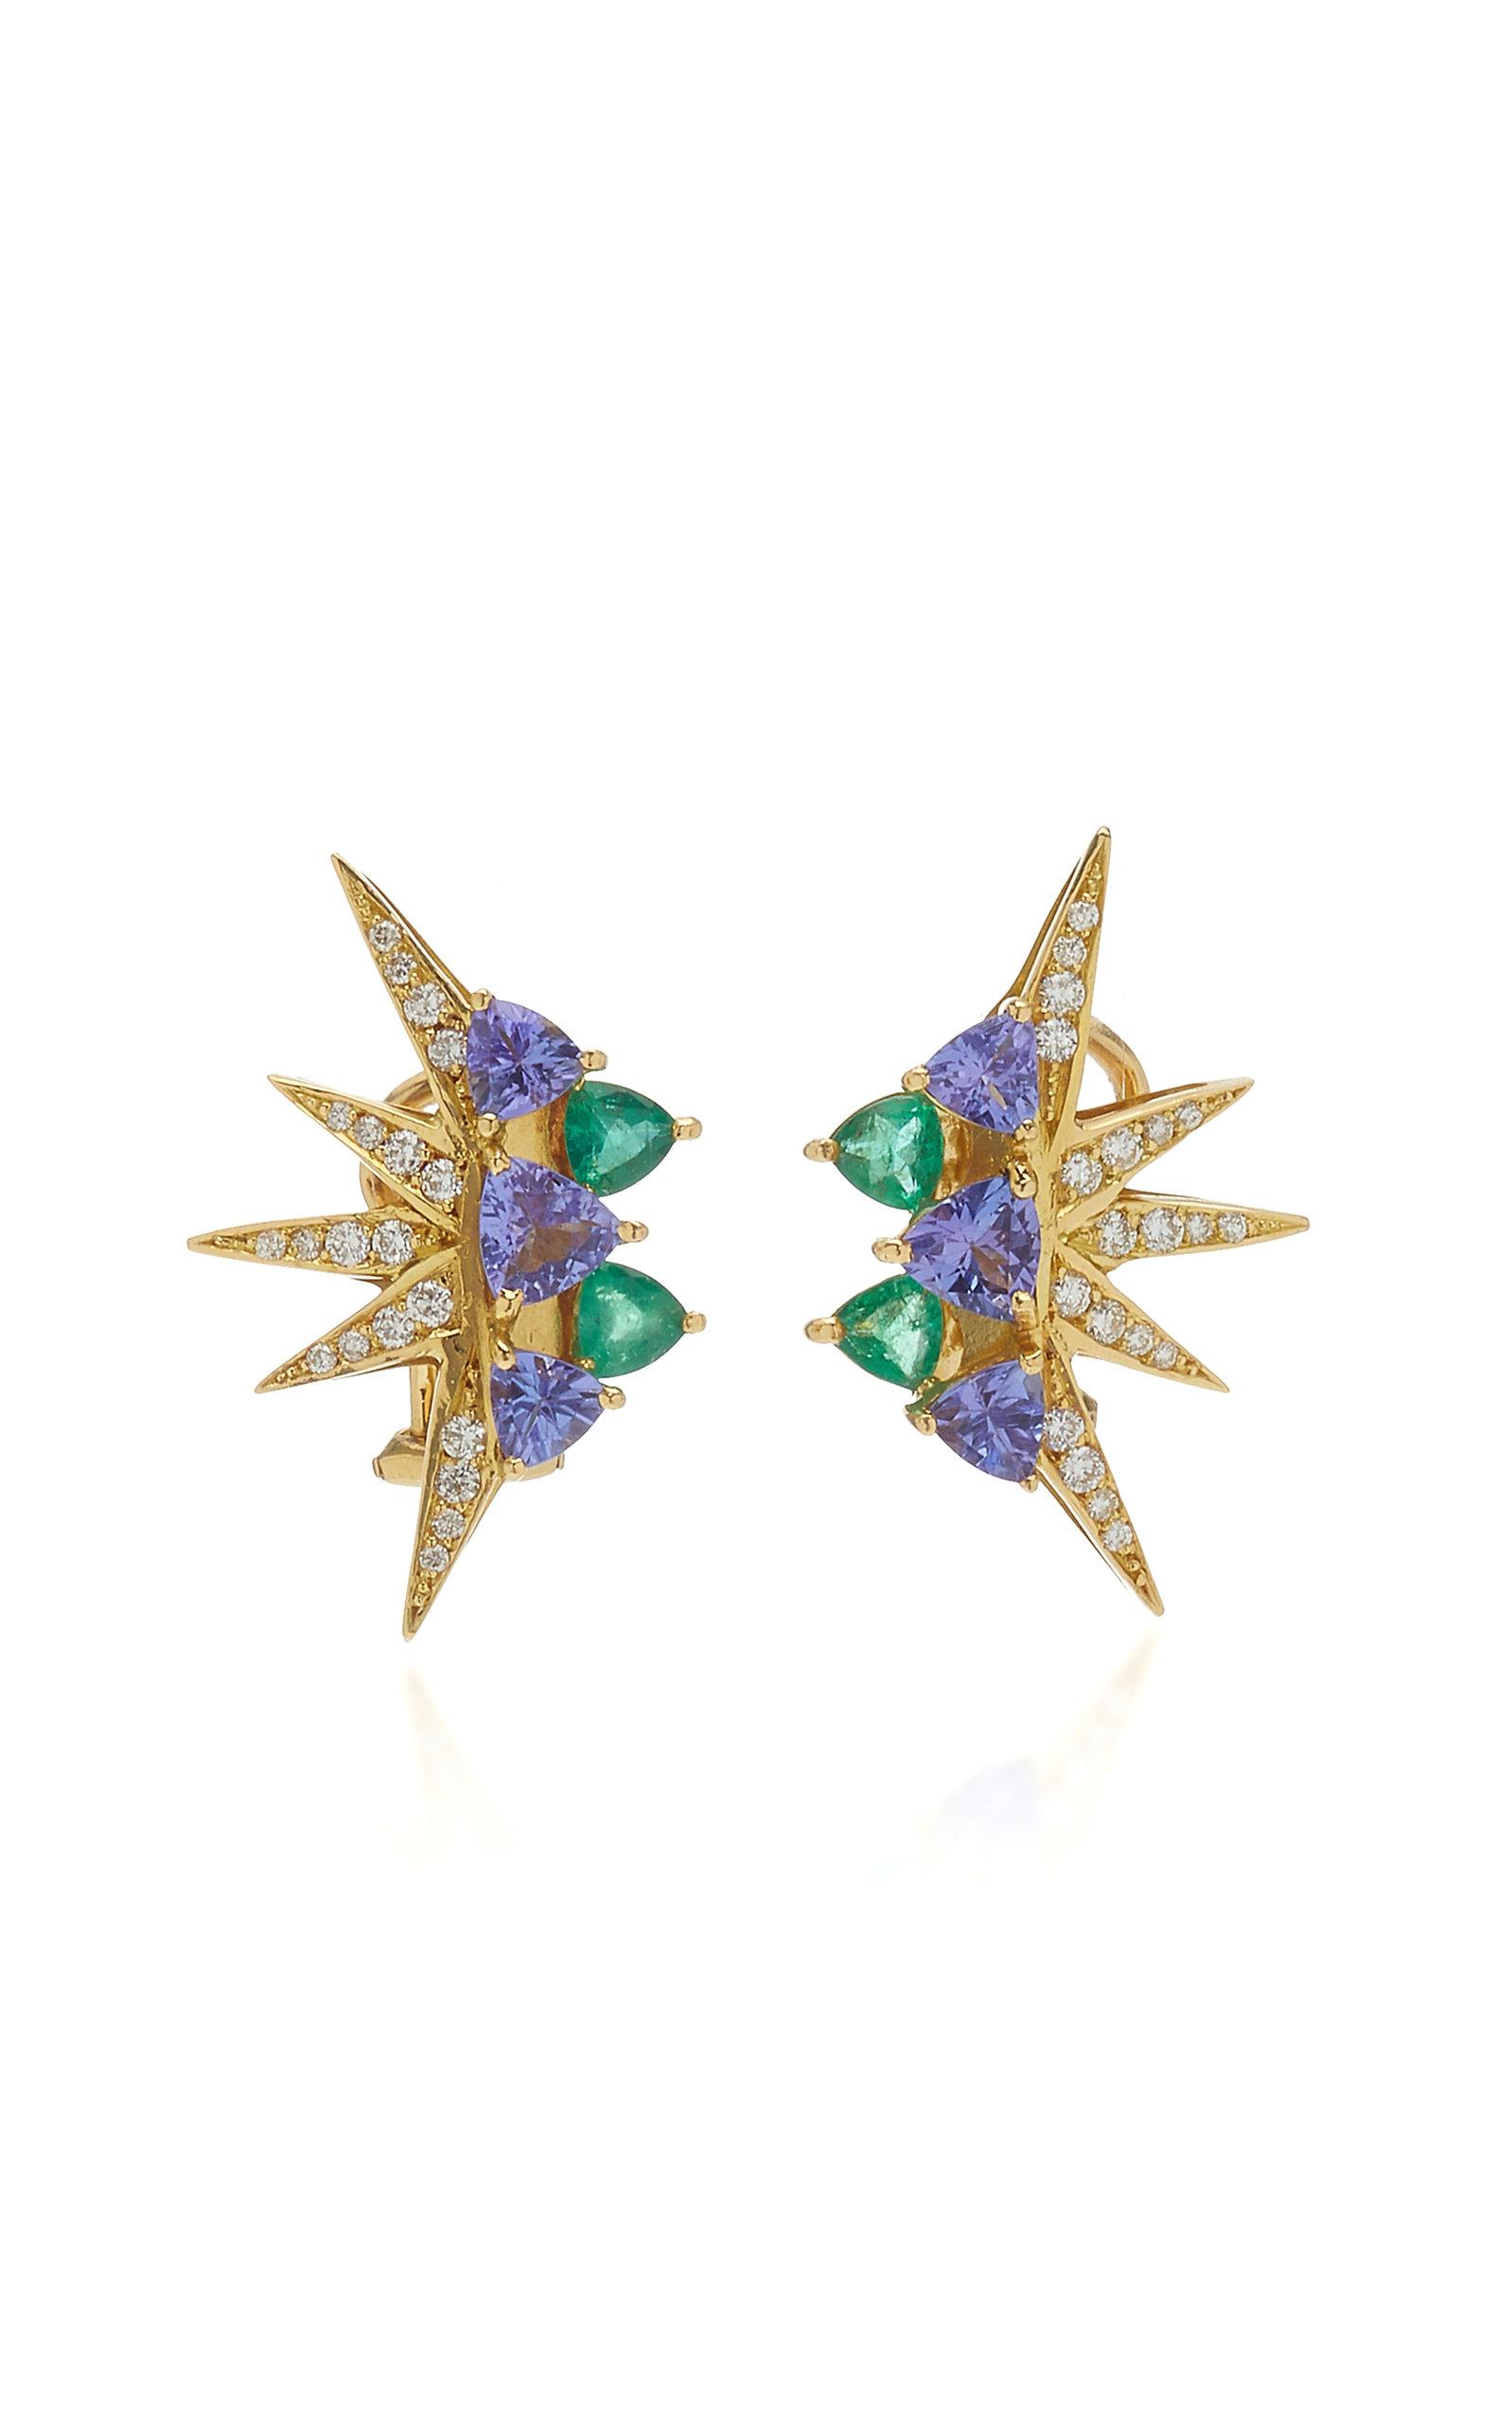 Women's Electra Mini 18K Yellow Gold Multi-Stone Earrings